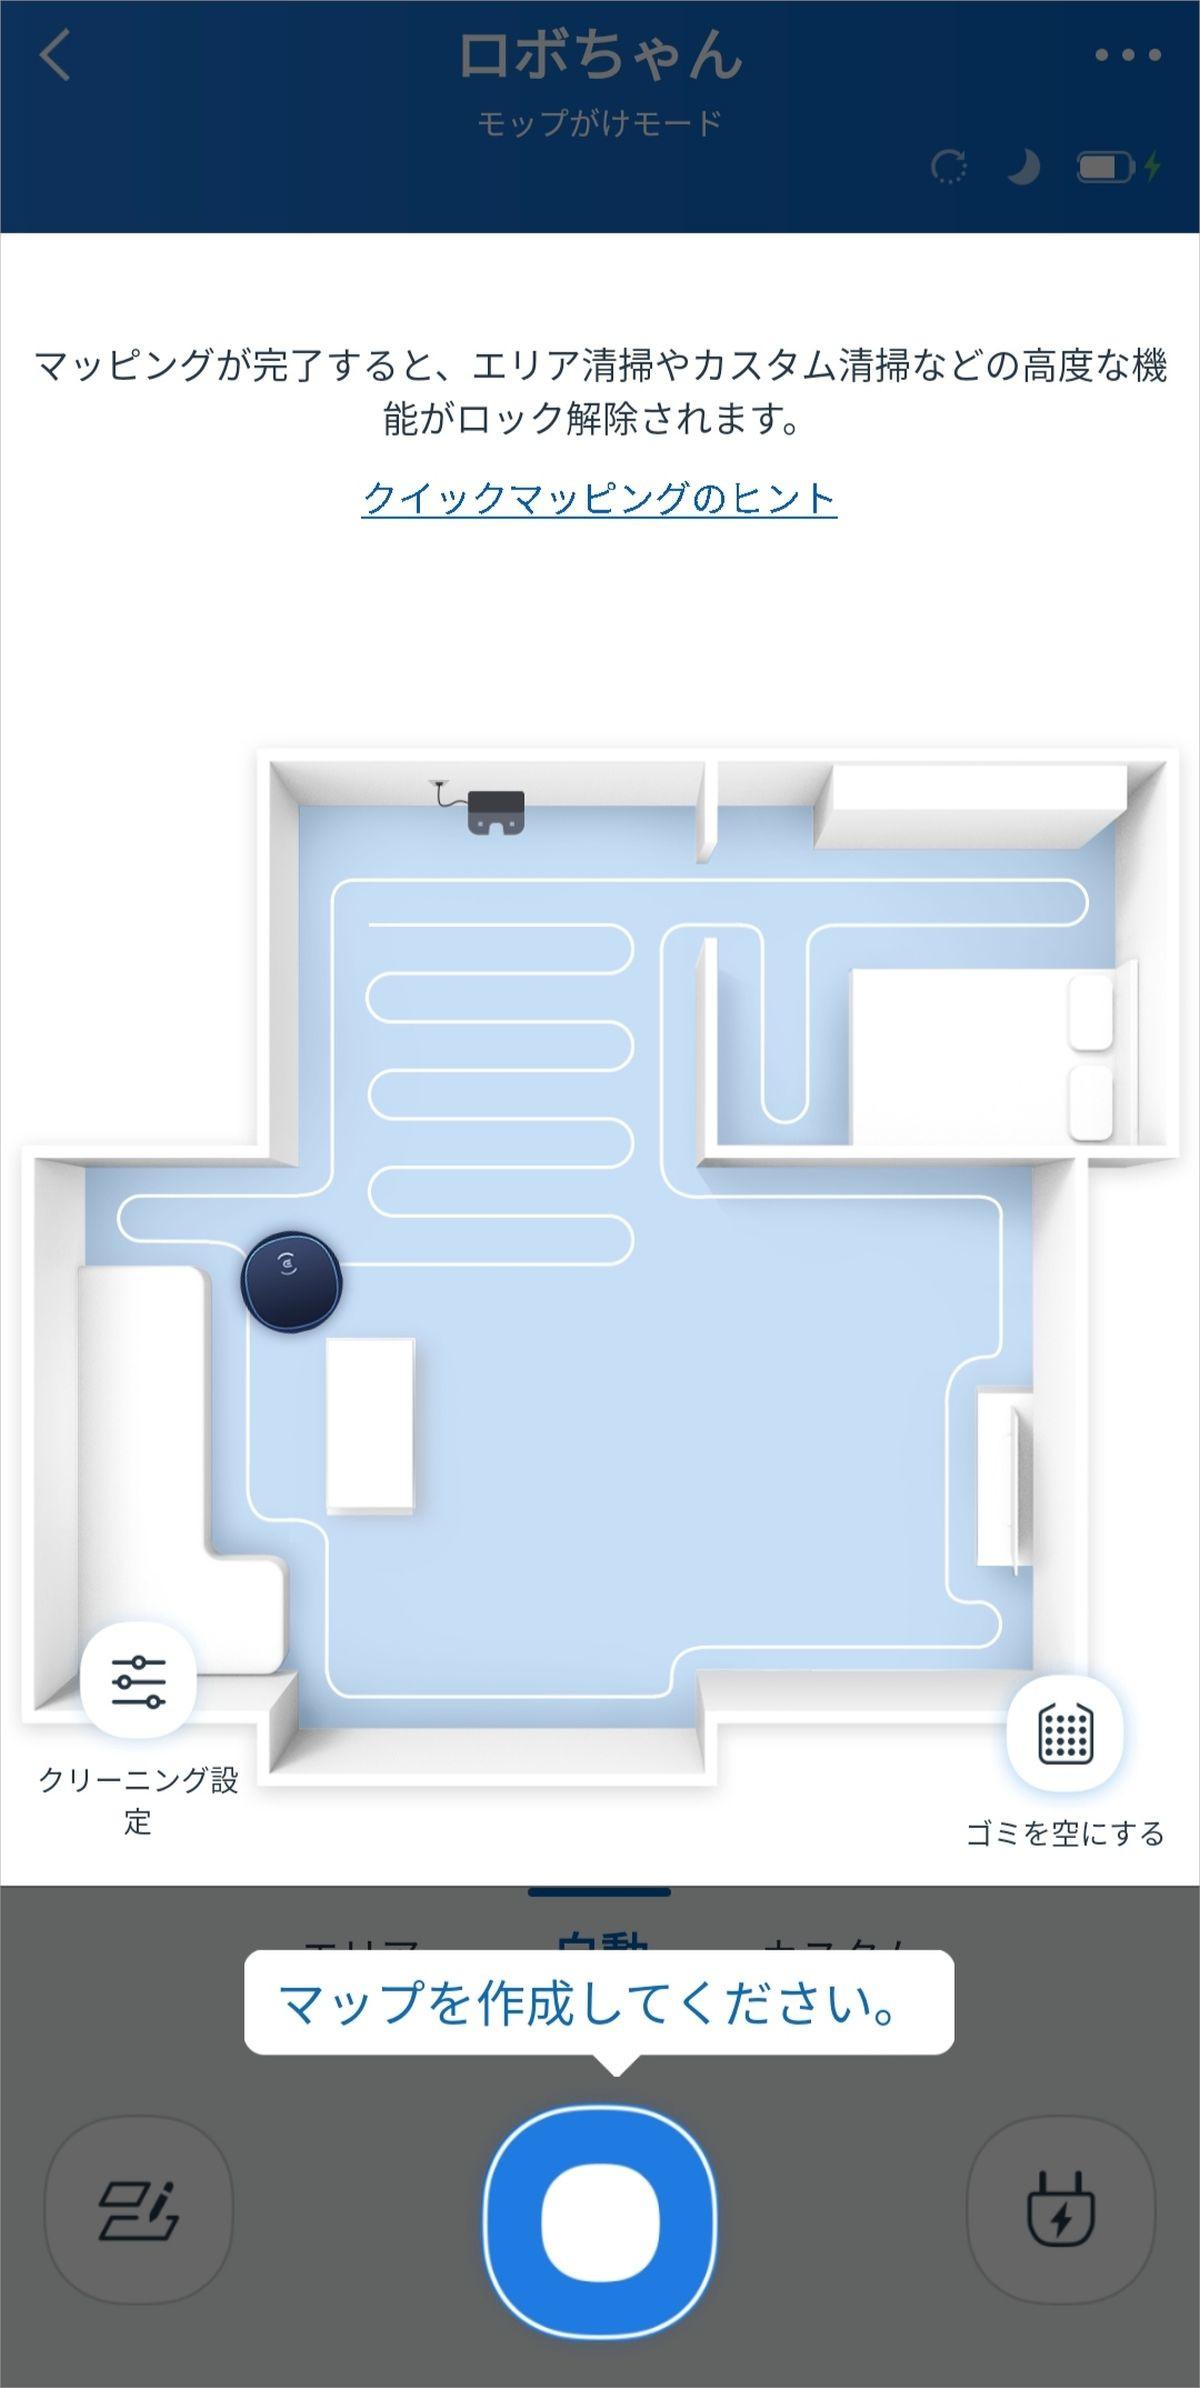 ECOVACS DEEBOT N8+ マッピング